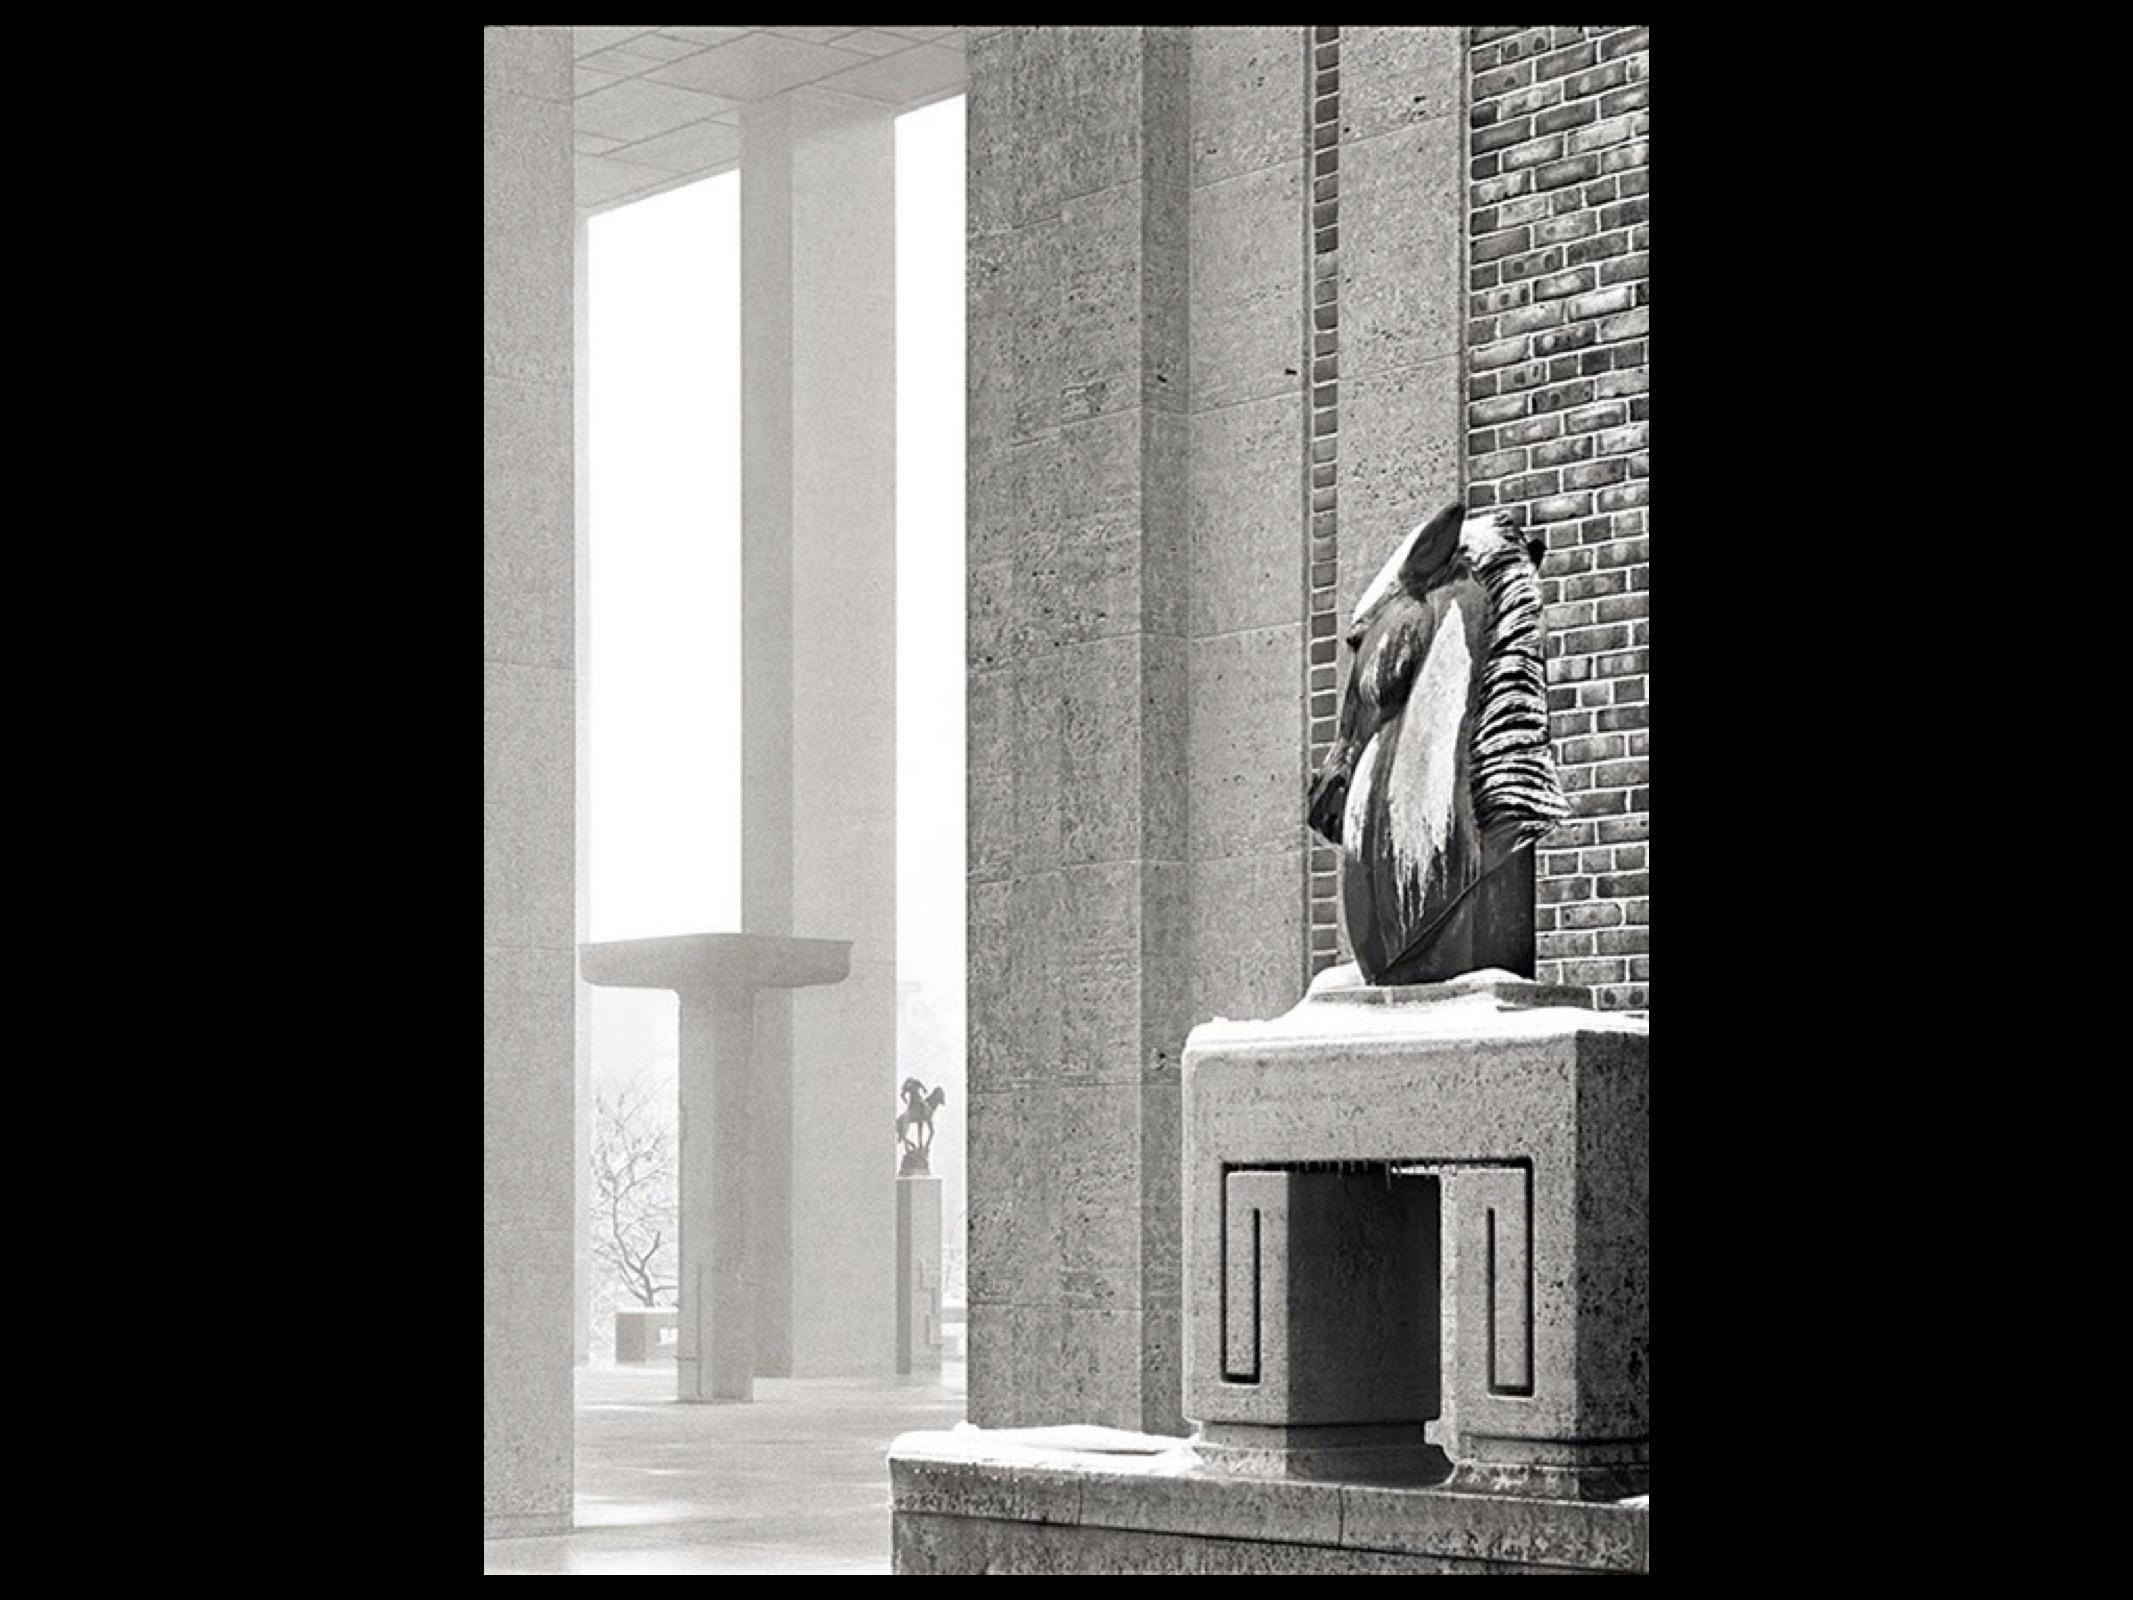 Cranbrook Academy of Art